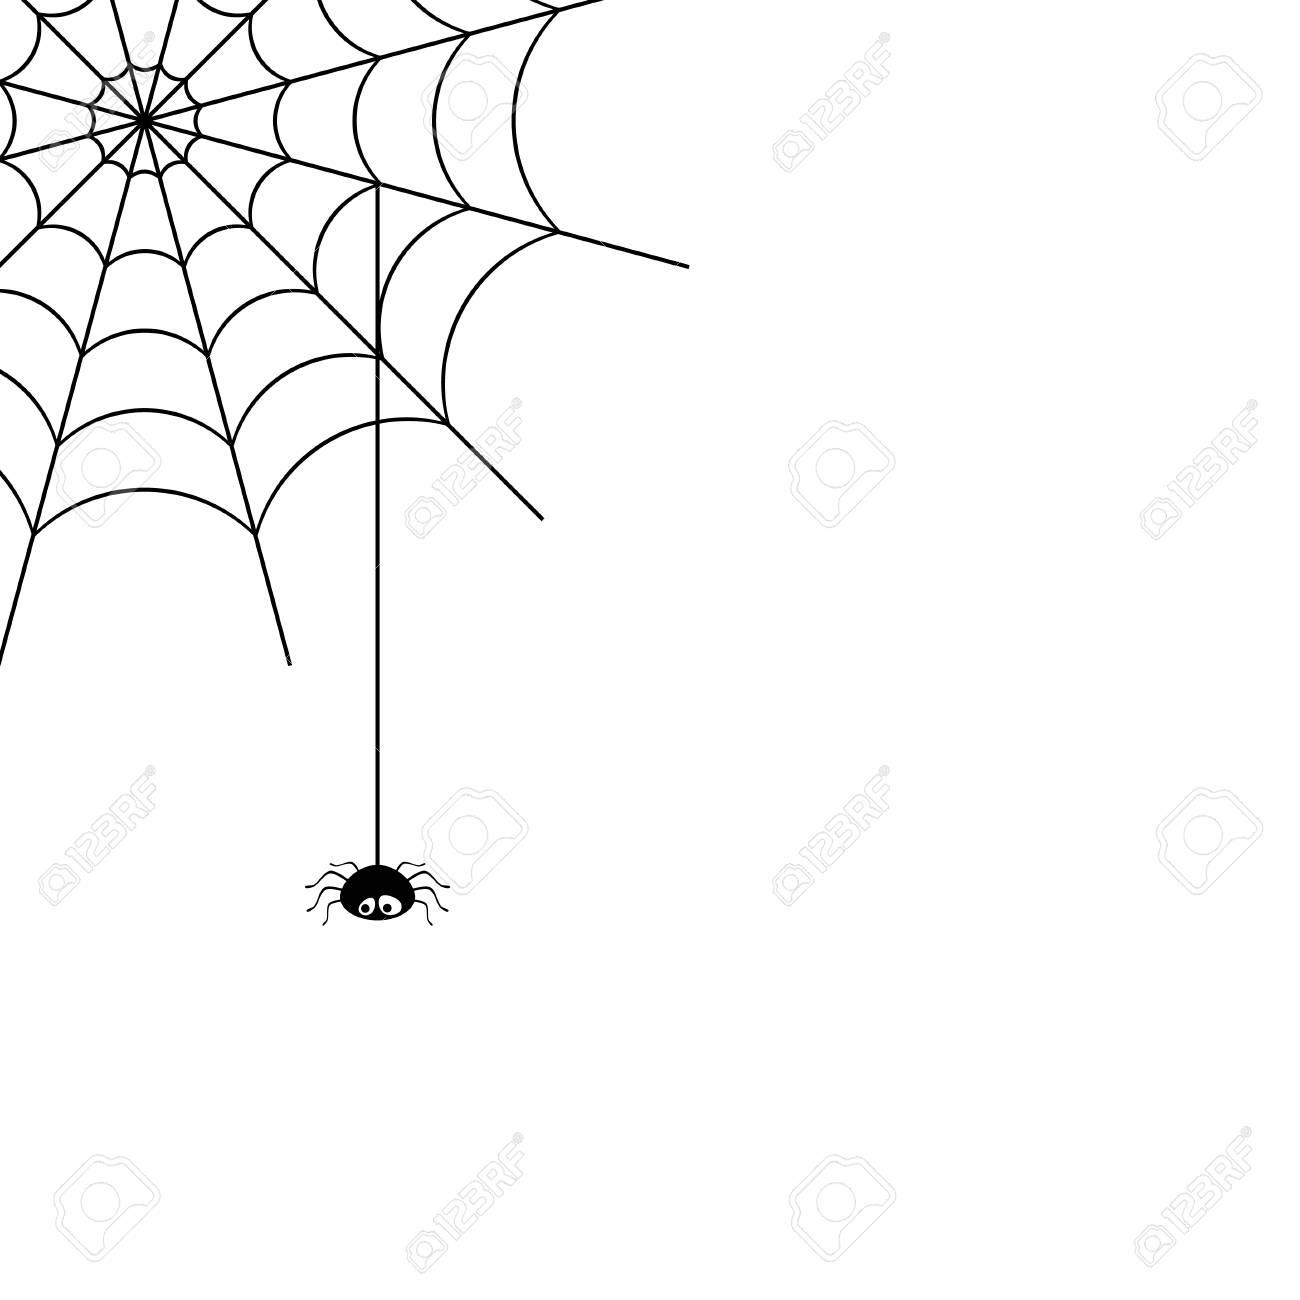 Toile D'araignée tout Dessin Toile Araignée